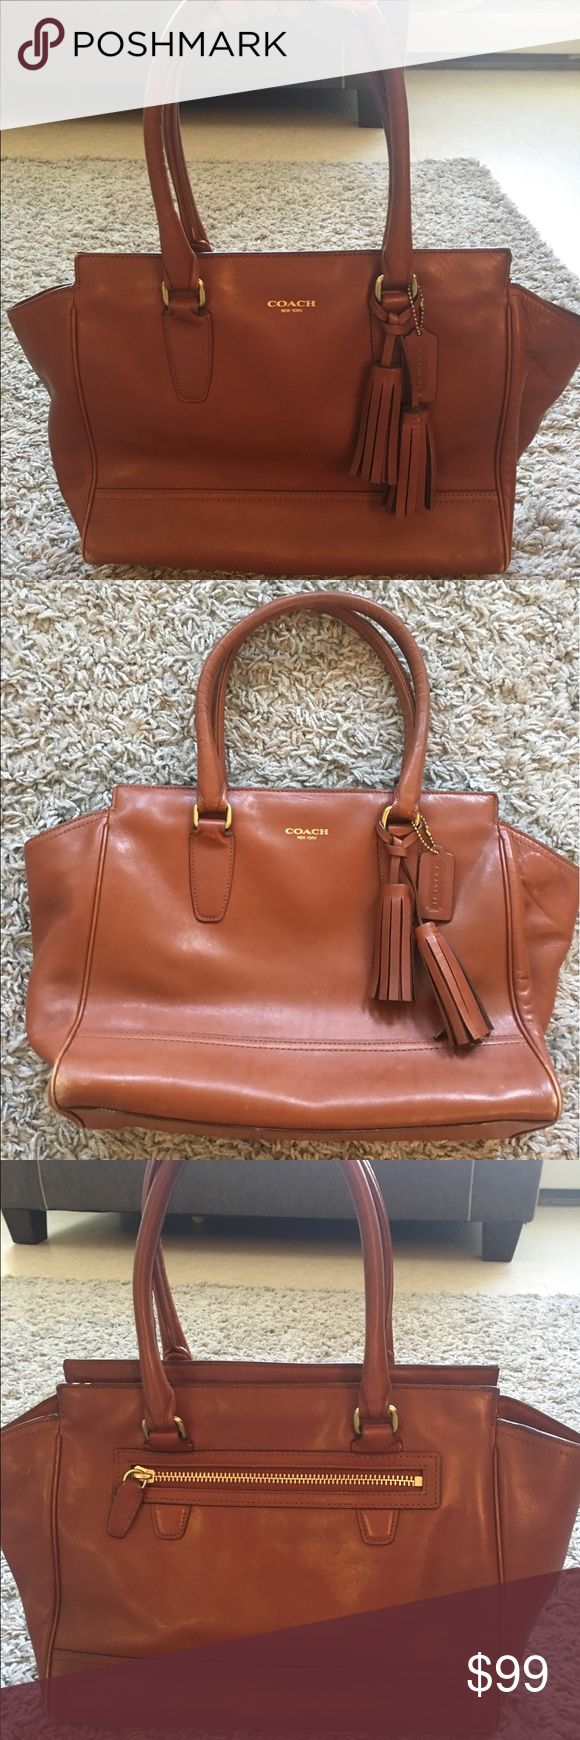 Coach leather handbag Beautiful classic authentic Coach purse. Coach Bags Shoulder Bags